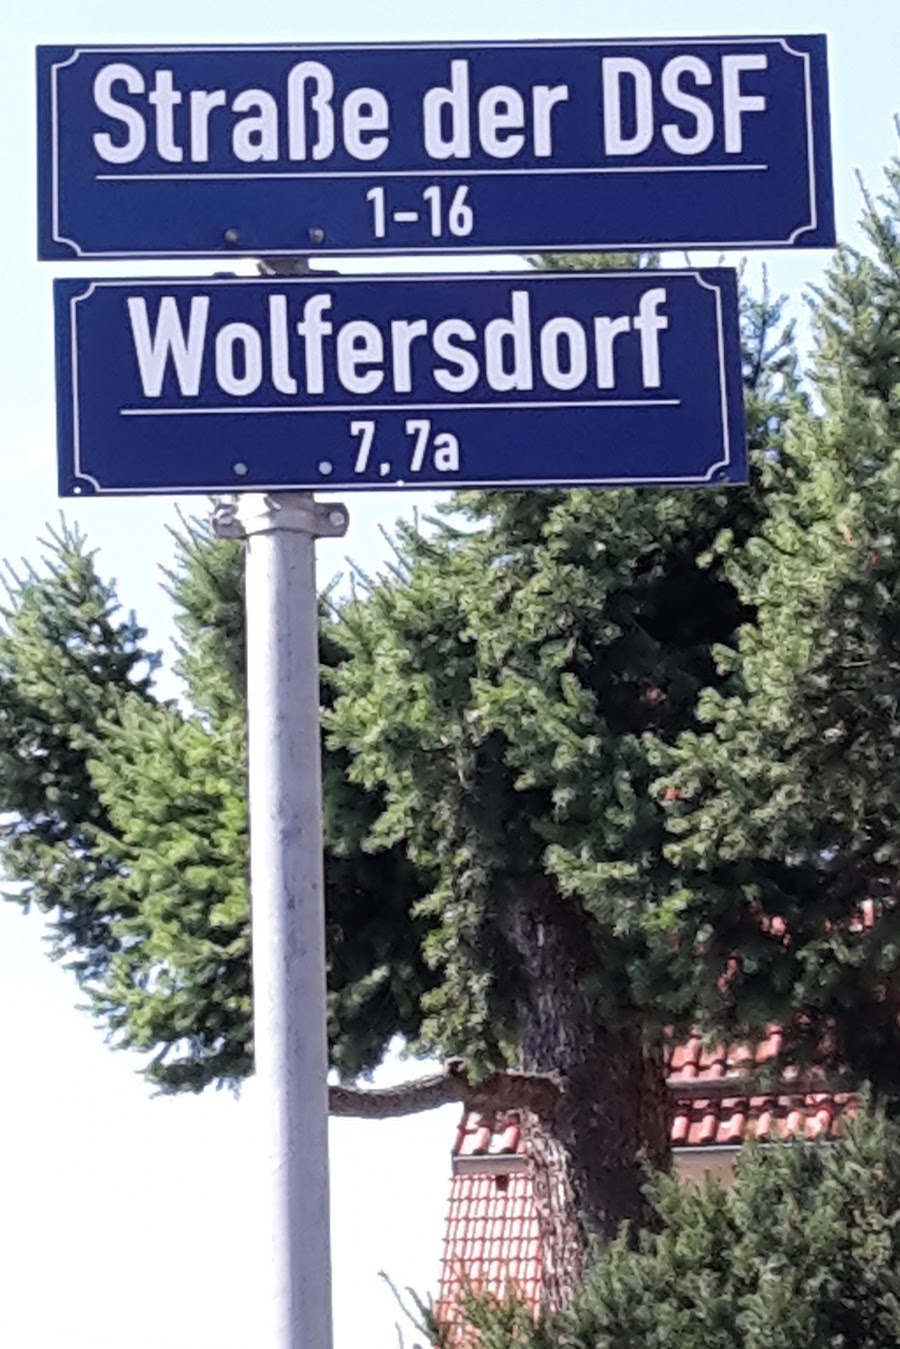 2017.08.29_Spaziergang 06 Trockenborn_Schloss Wolfersdorf